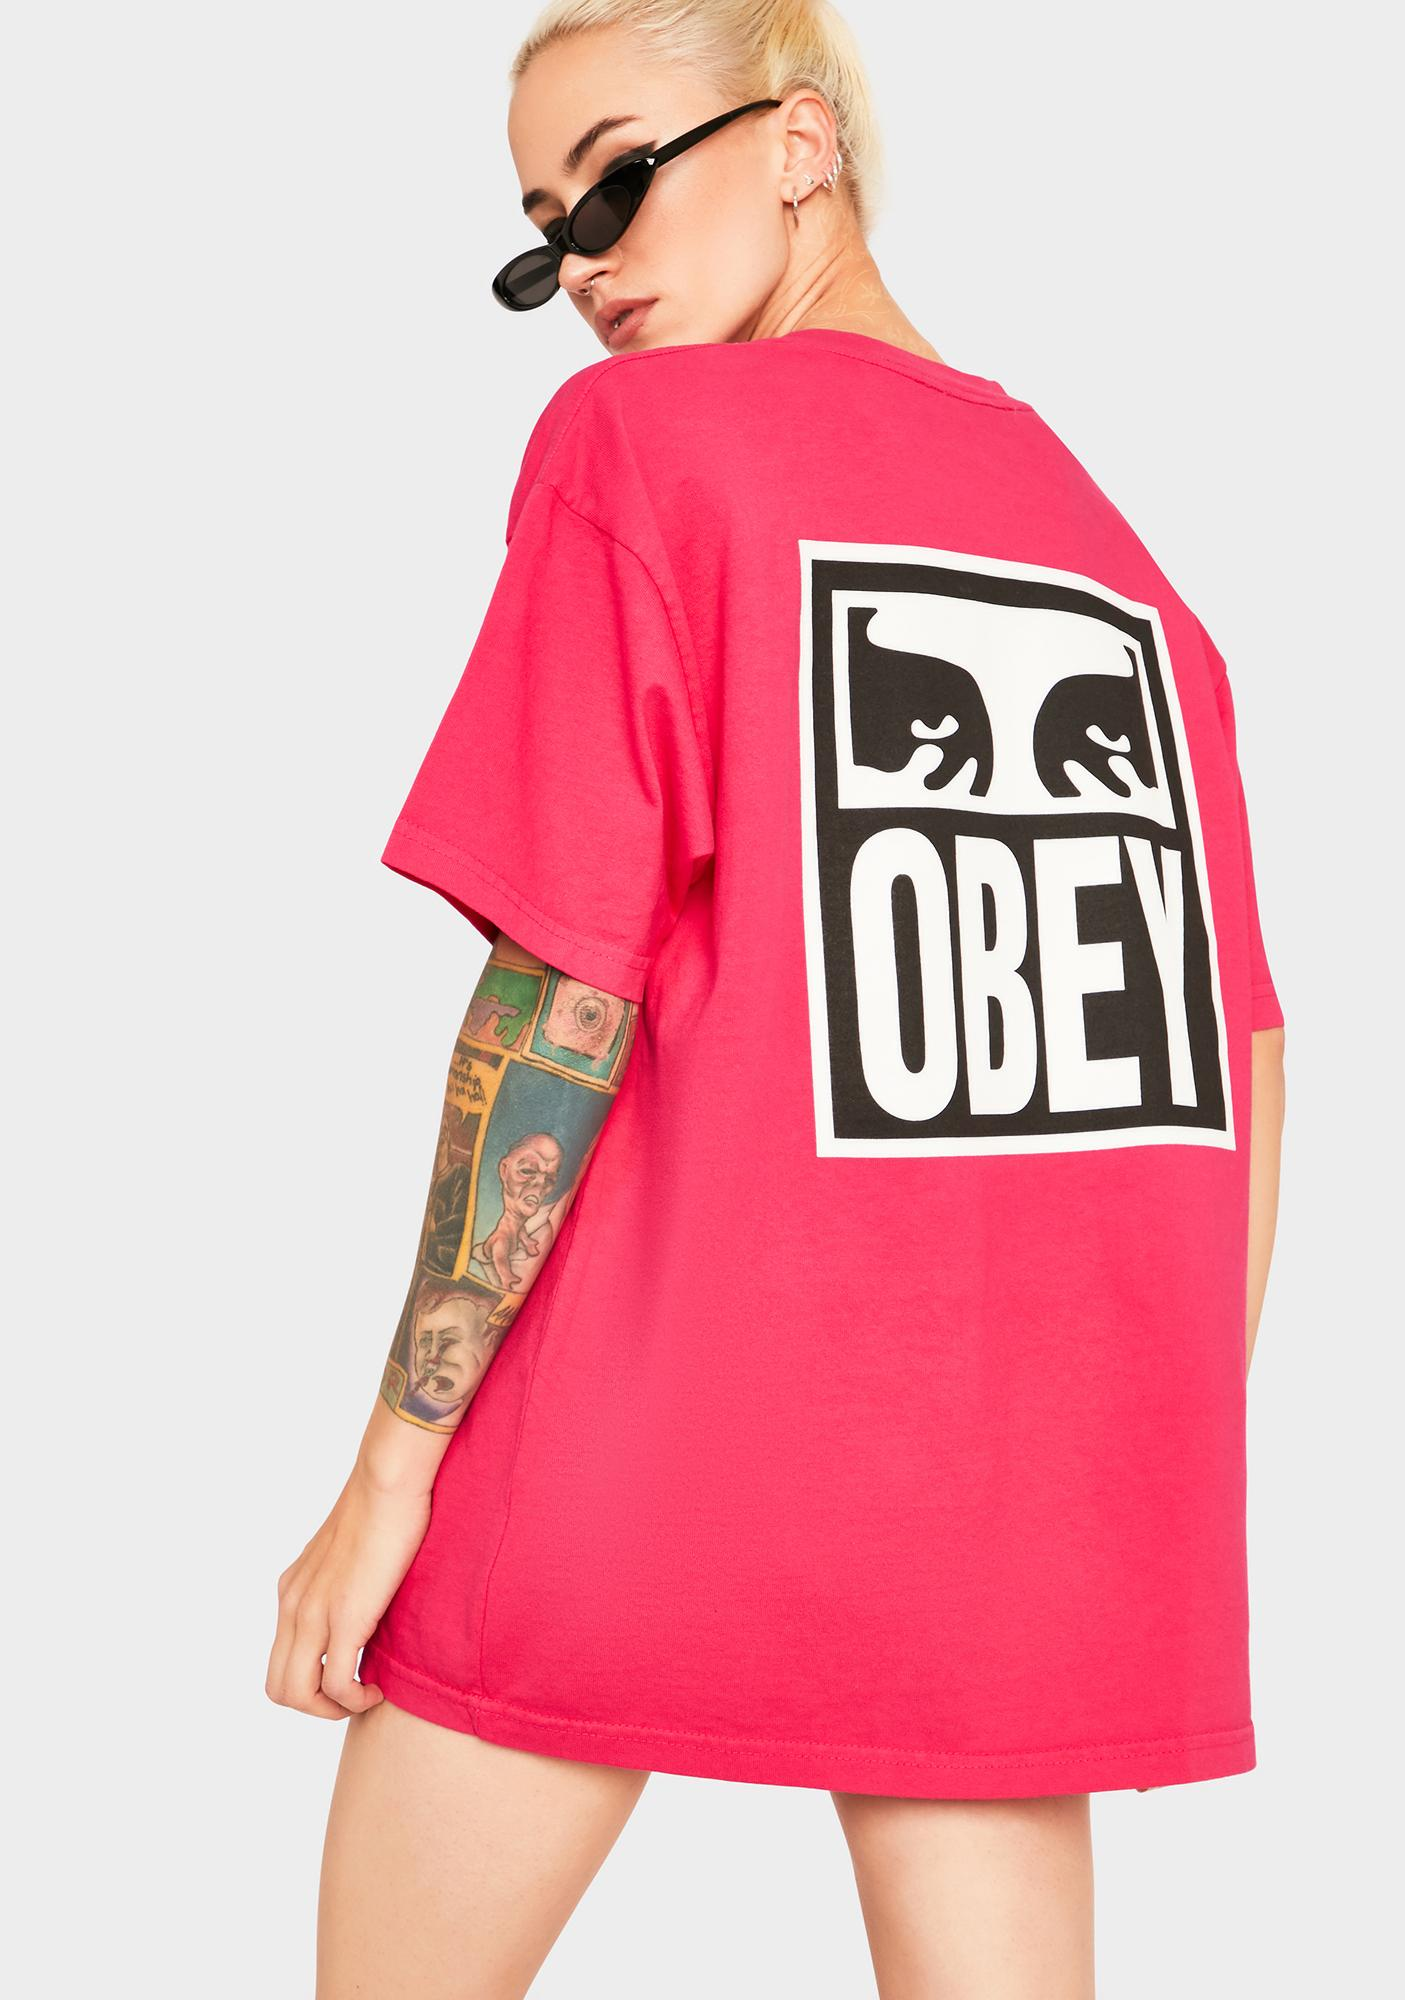 Obey Eyes Icons II Heavyweight Graphic Tee